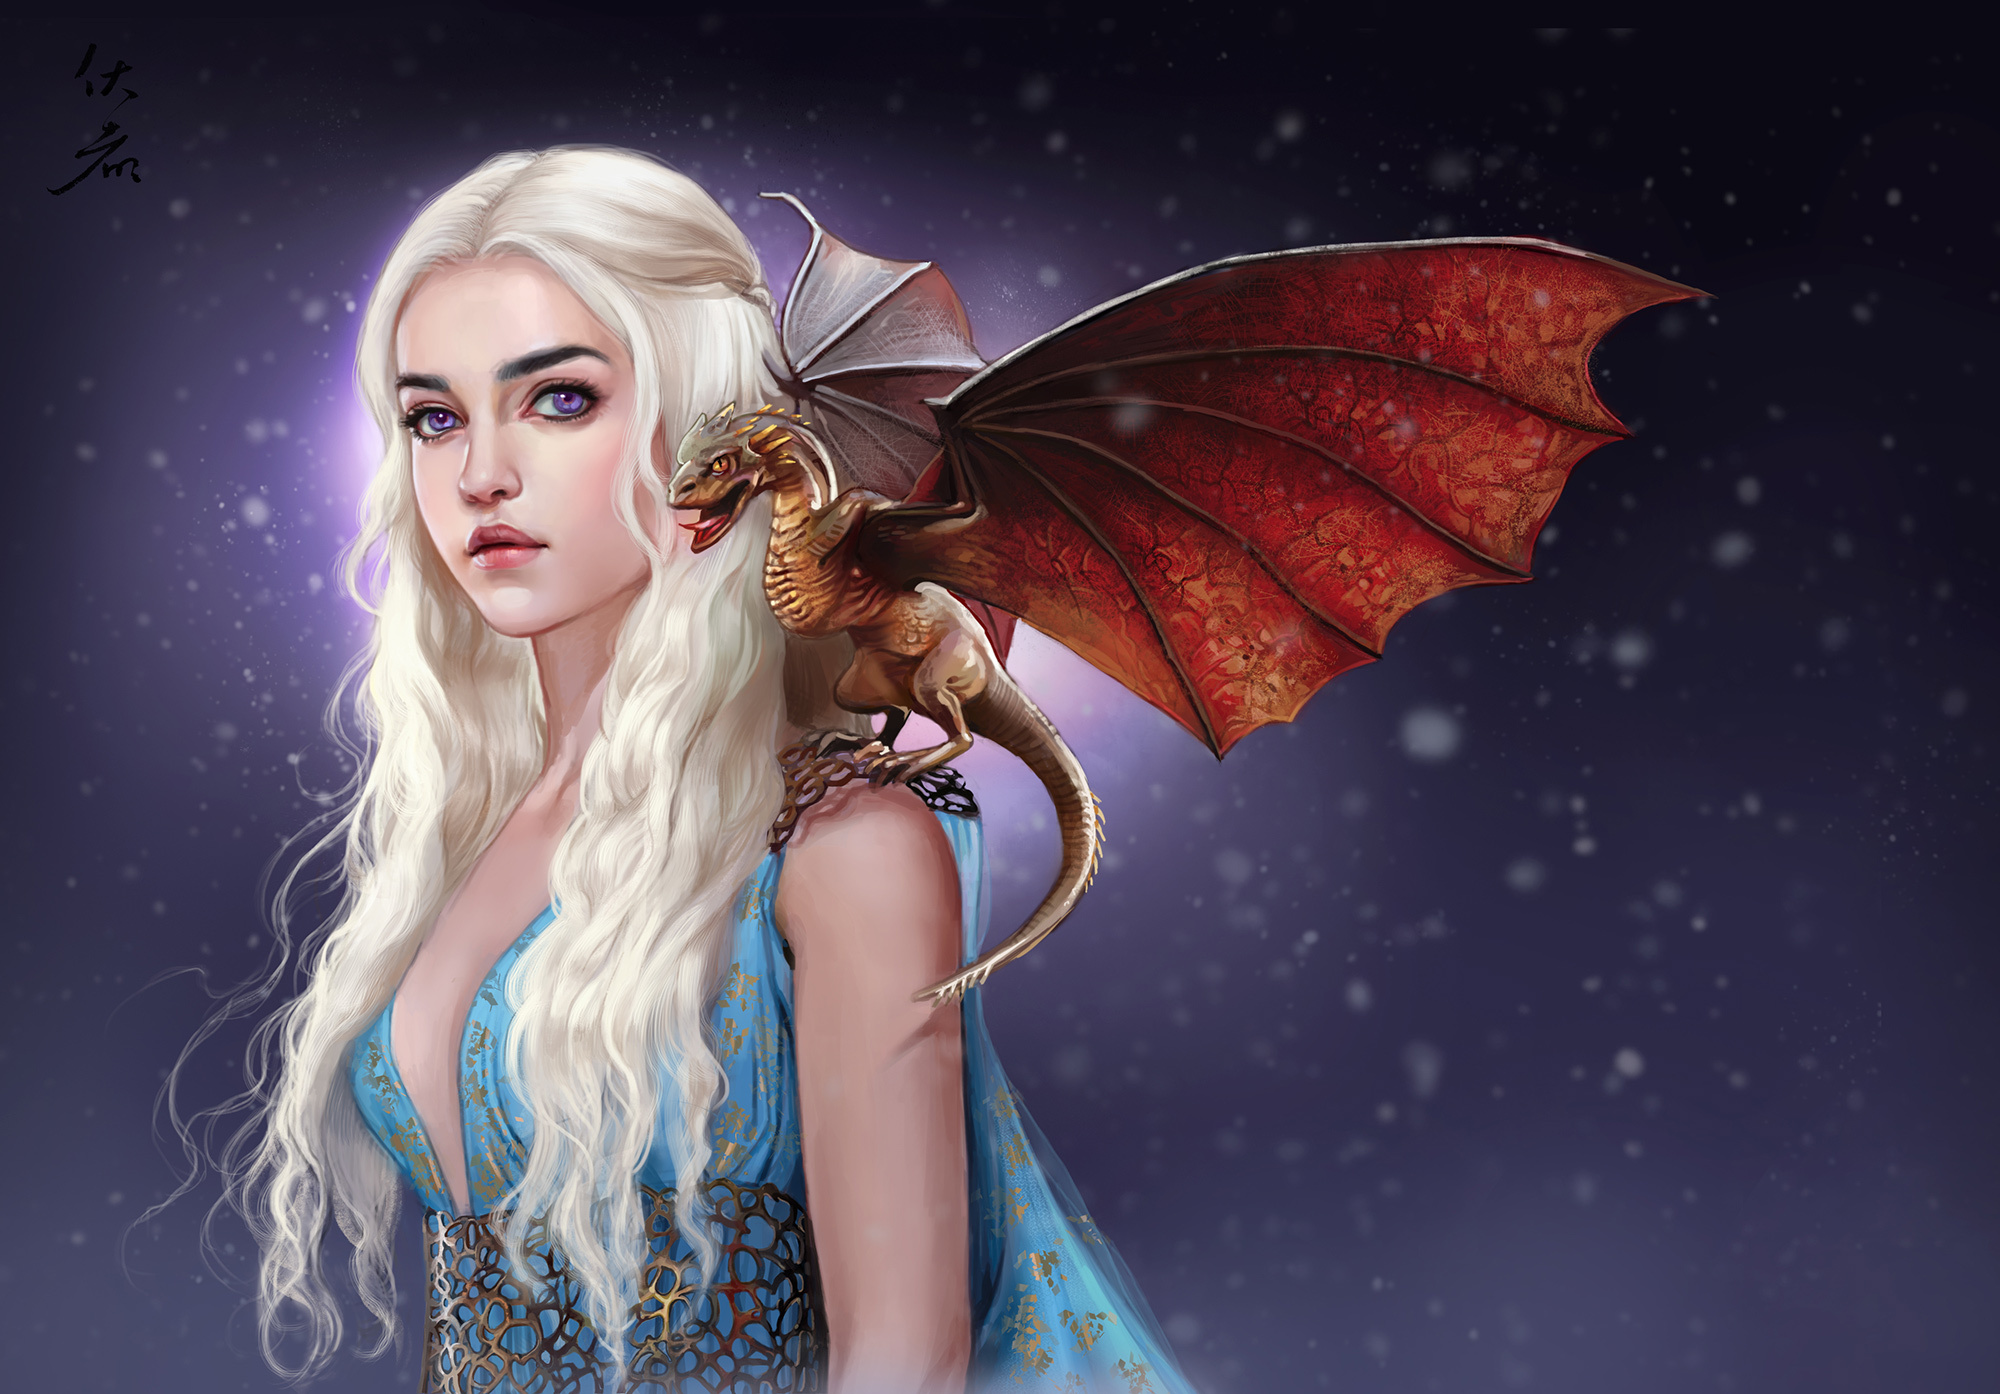 khaleesi wallpaper game - photo #9